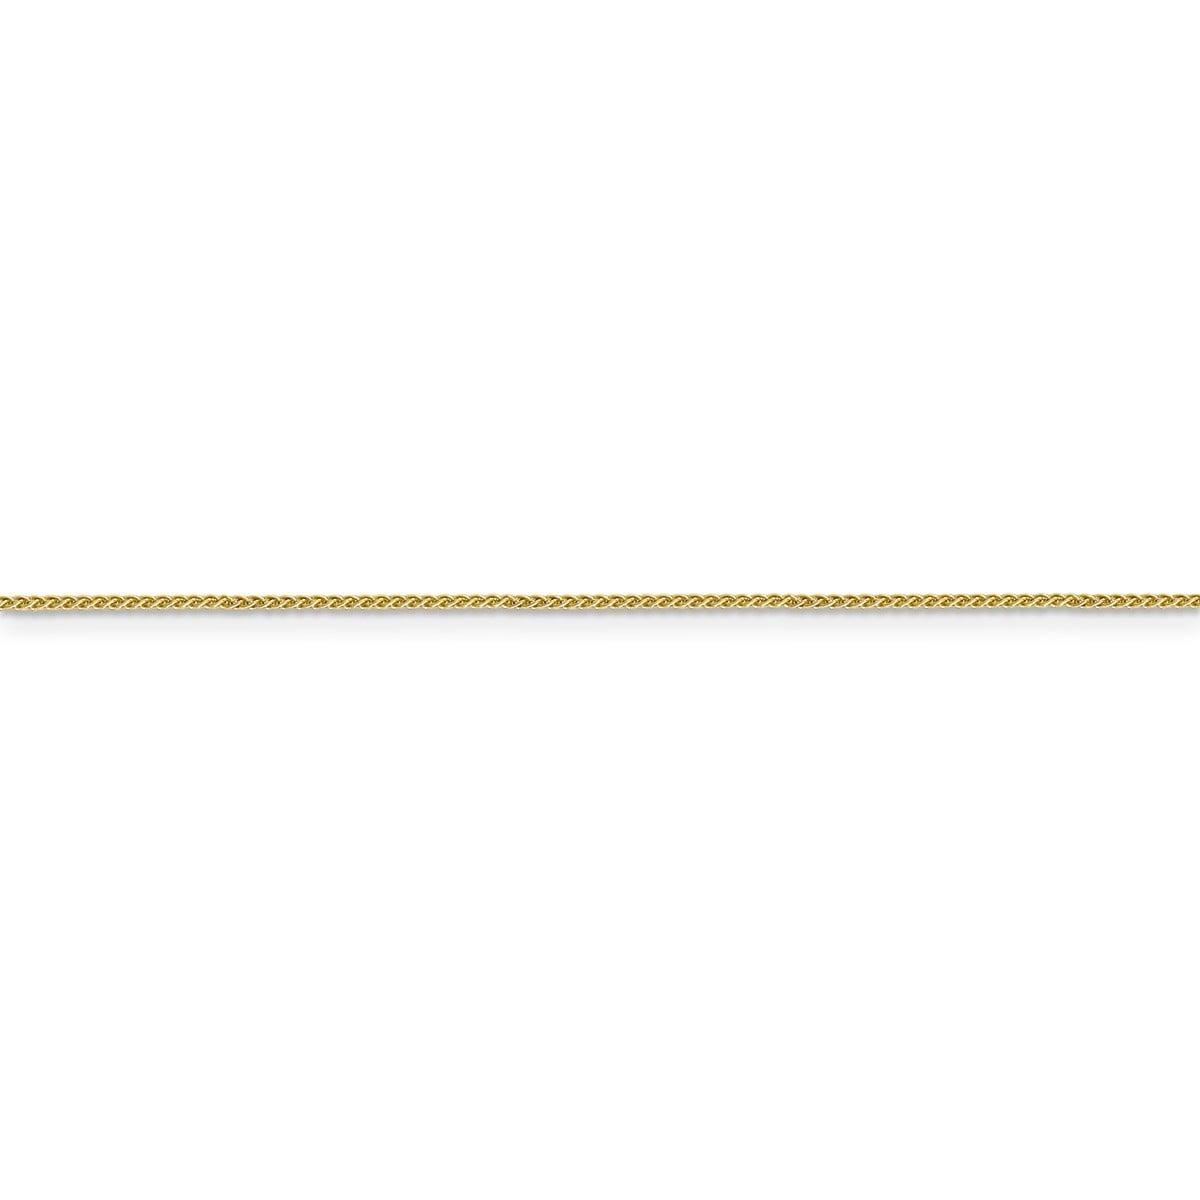 Top 10 Jewelry Gift 14k 0.80mm Spiga Pendant Chain